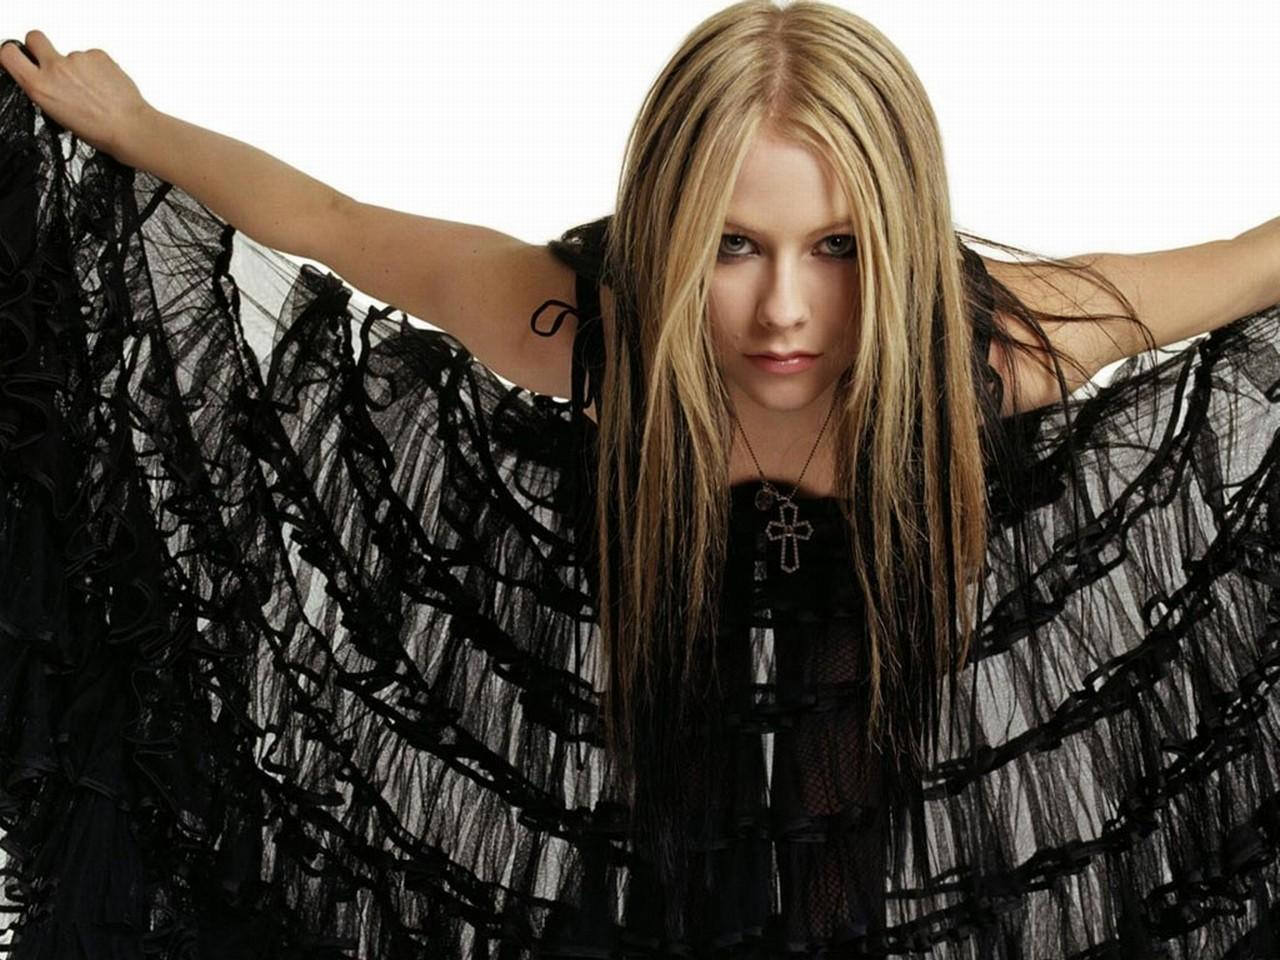 http://3.bp.blogspot.com/-wpqrUEt7N2U/UNvNs5TyQ1I/AAAAAAAAAJk/EBzldYOAUqk/s1600/Avril+Lavigne+4.jpg